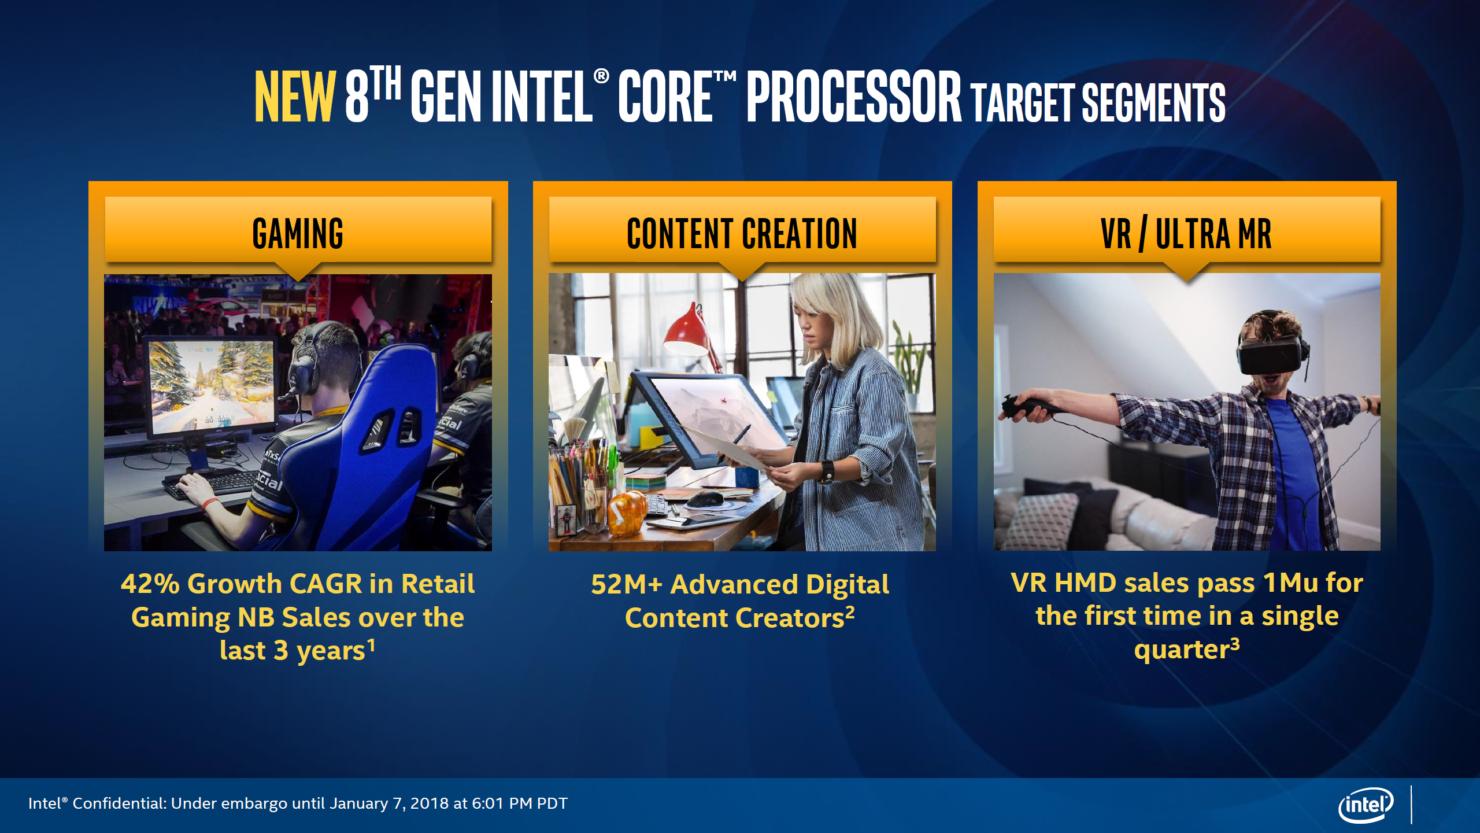 intel-8th-generation-core-processors-with-amd-radeon-rx-vega-m-graphics_3